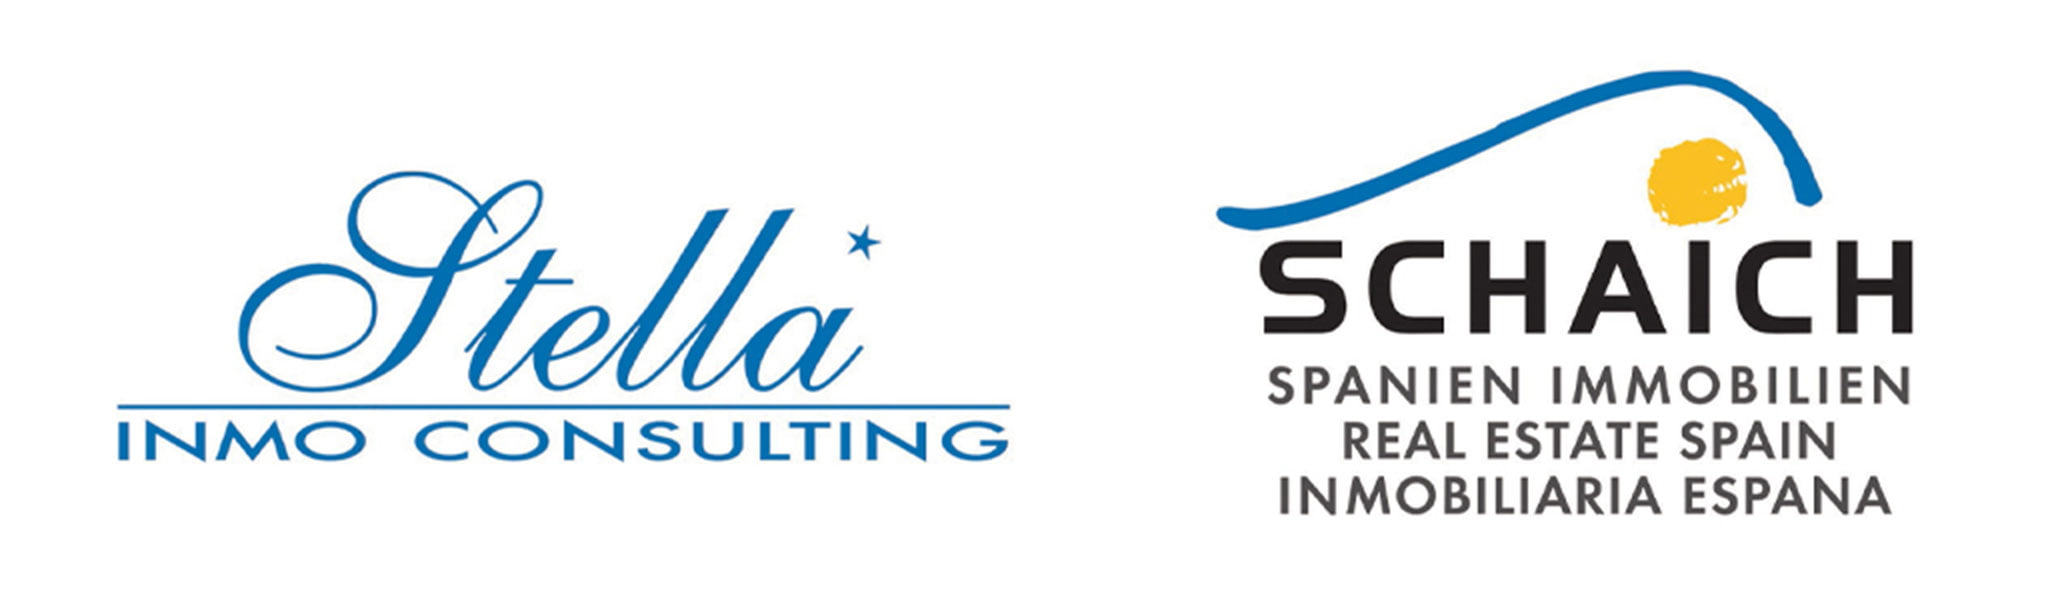 Logotip de Stella Inmo Consulting